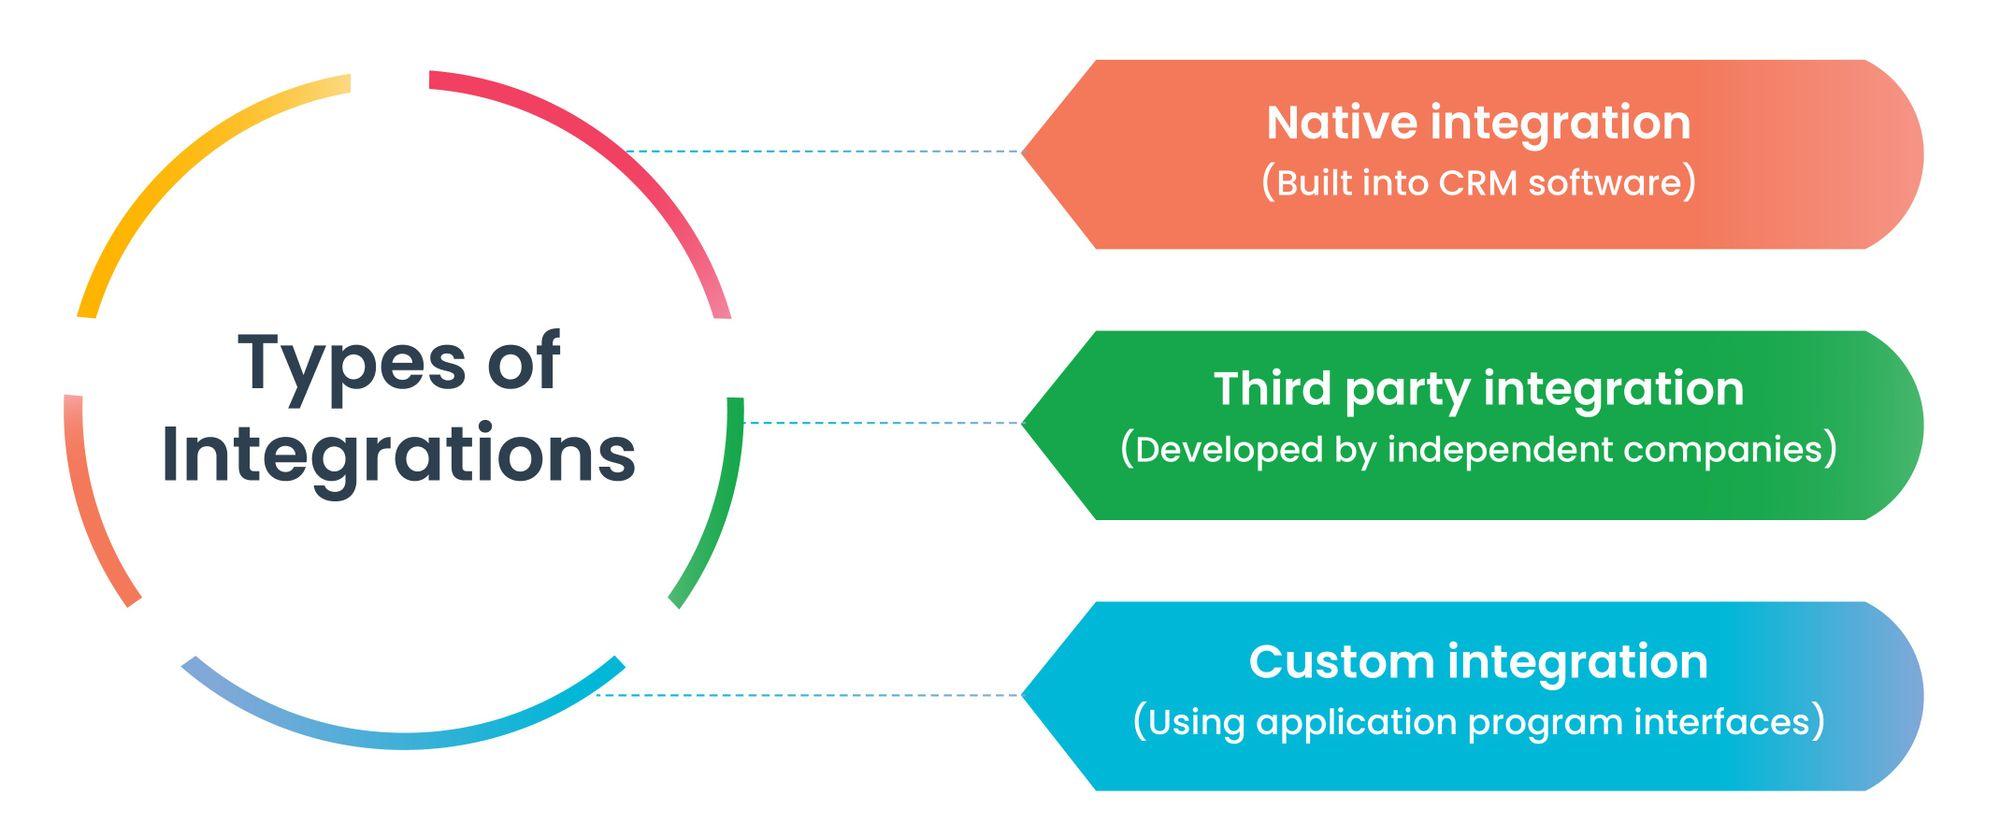 Integration Types: Native Integration, Third-party integration, Custom integration